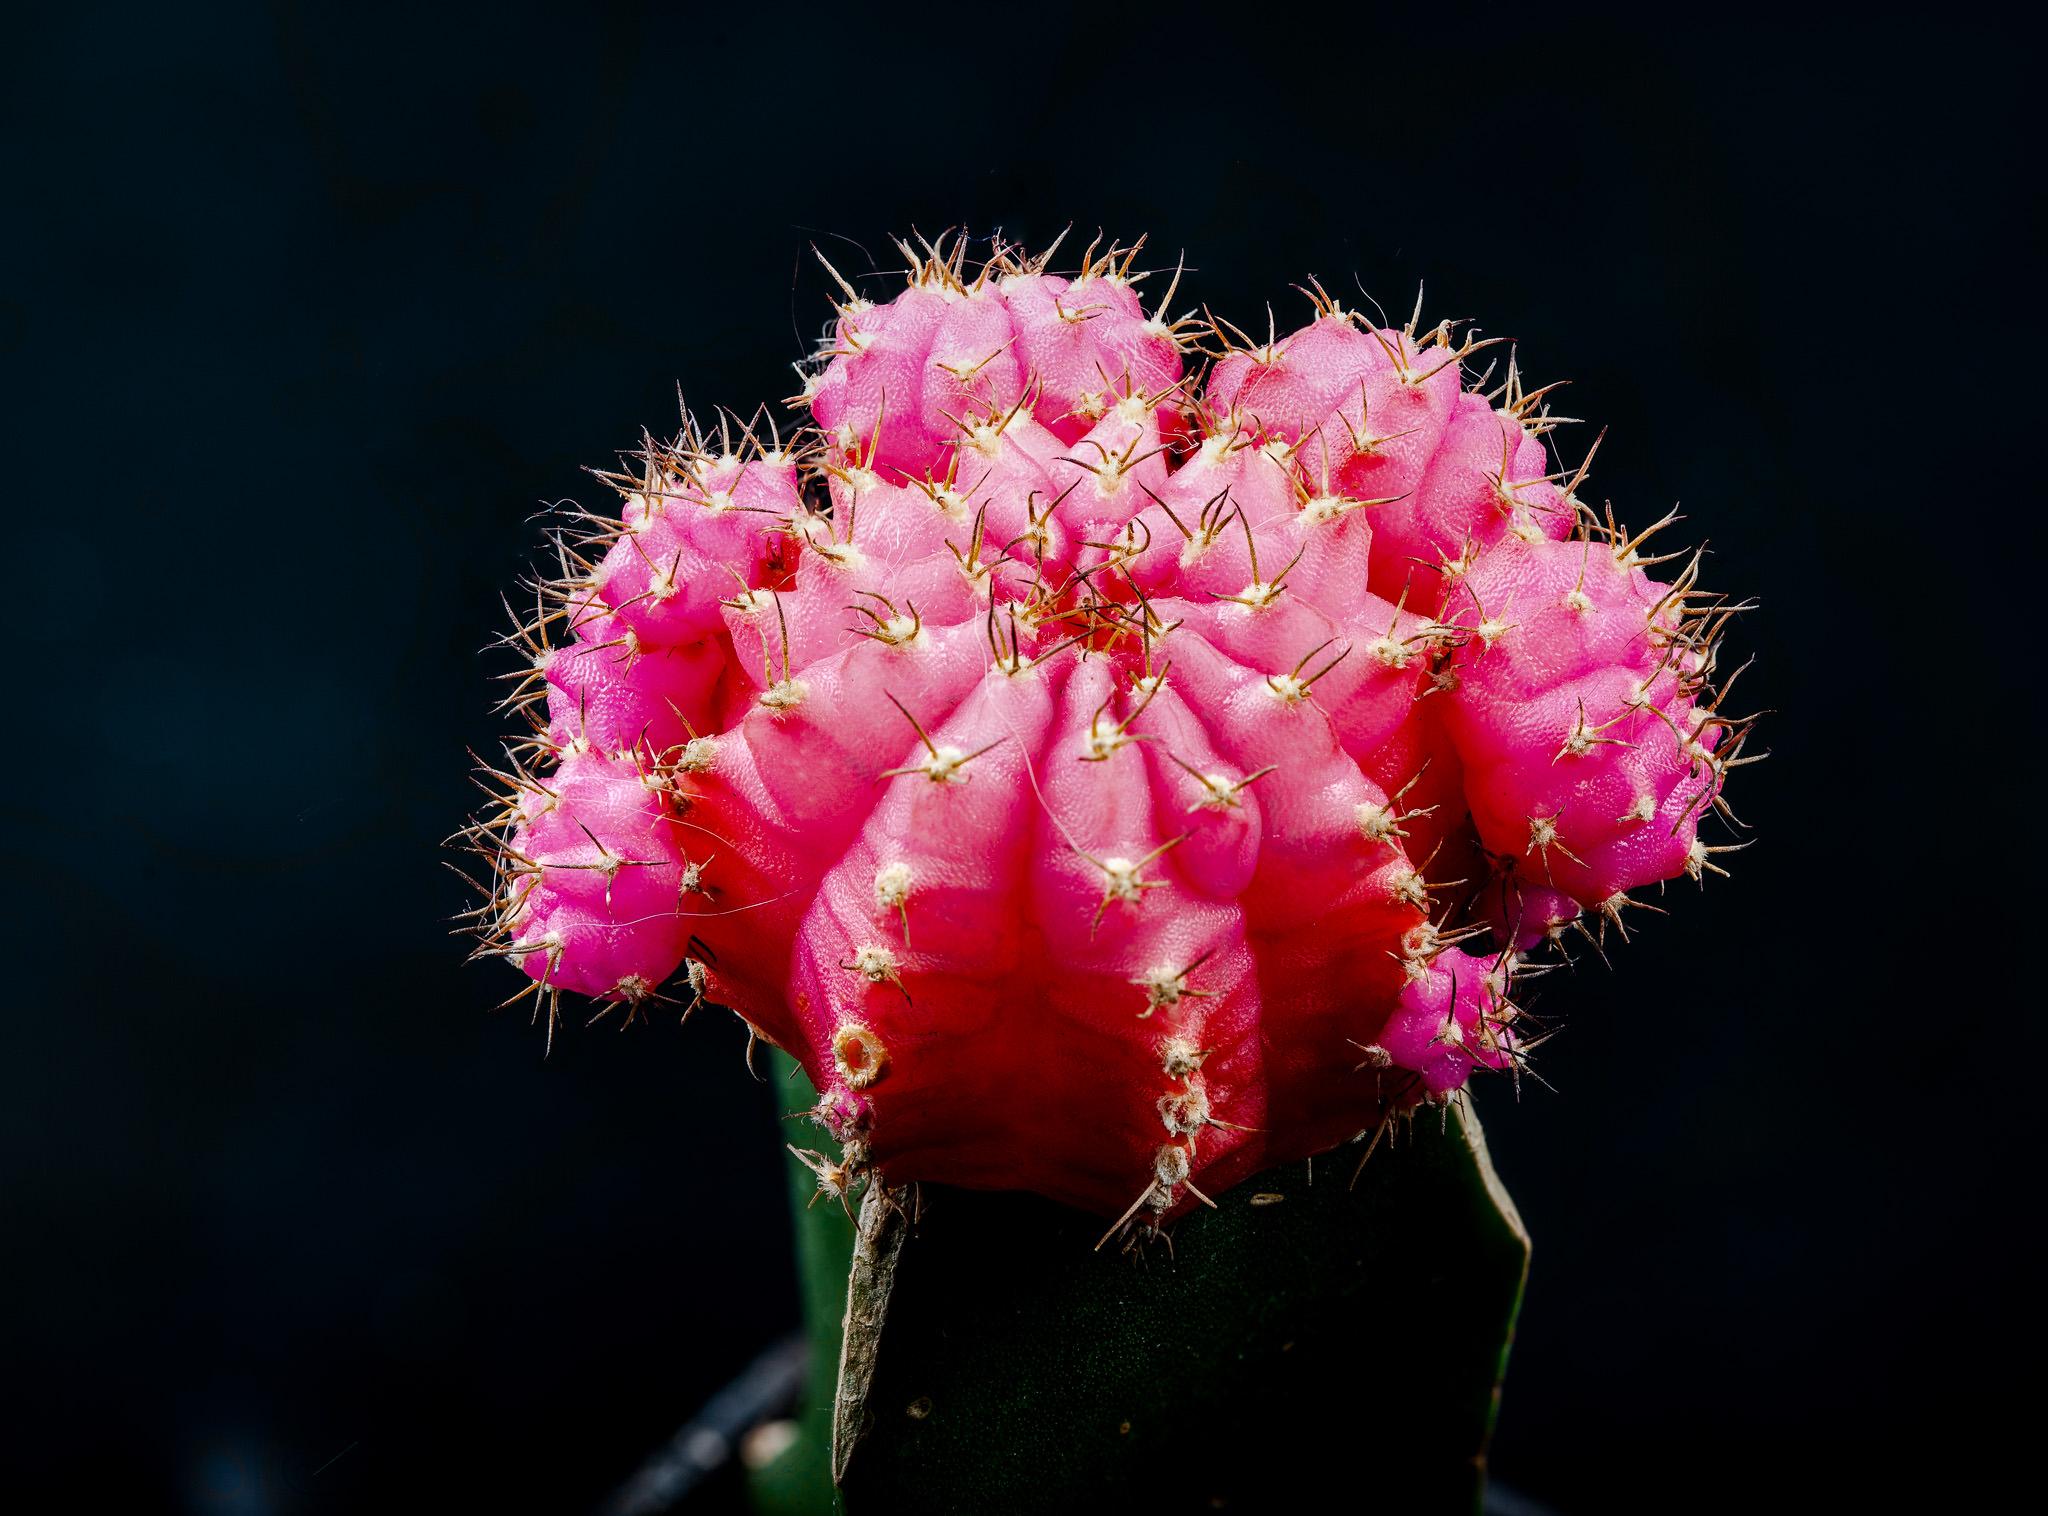 41 shot stacked cactus